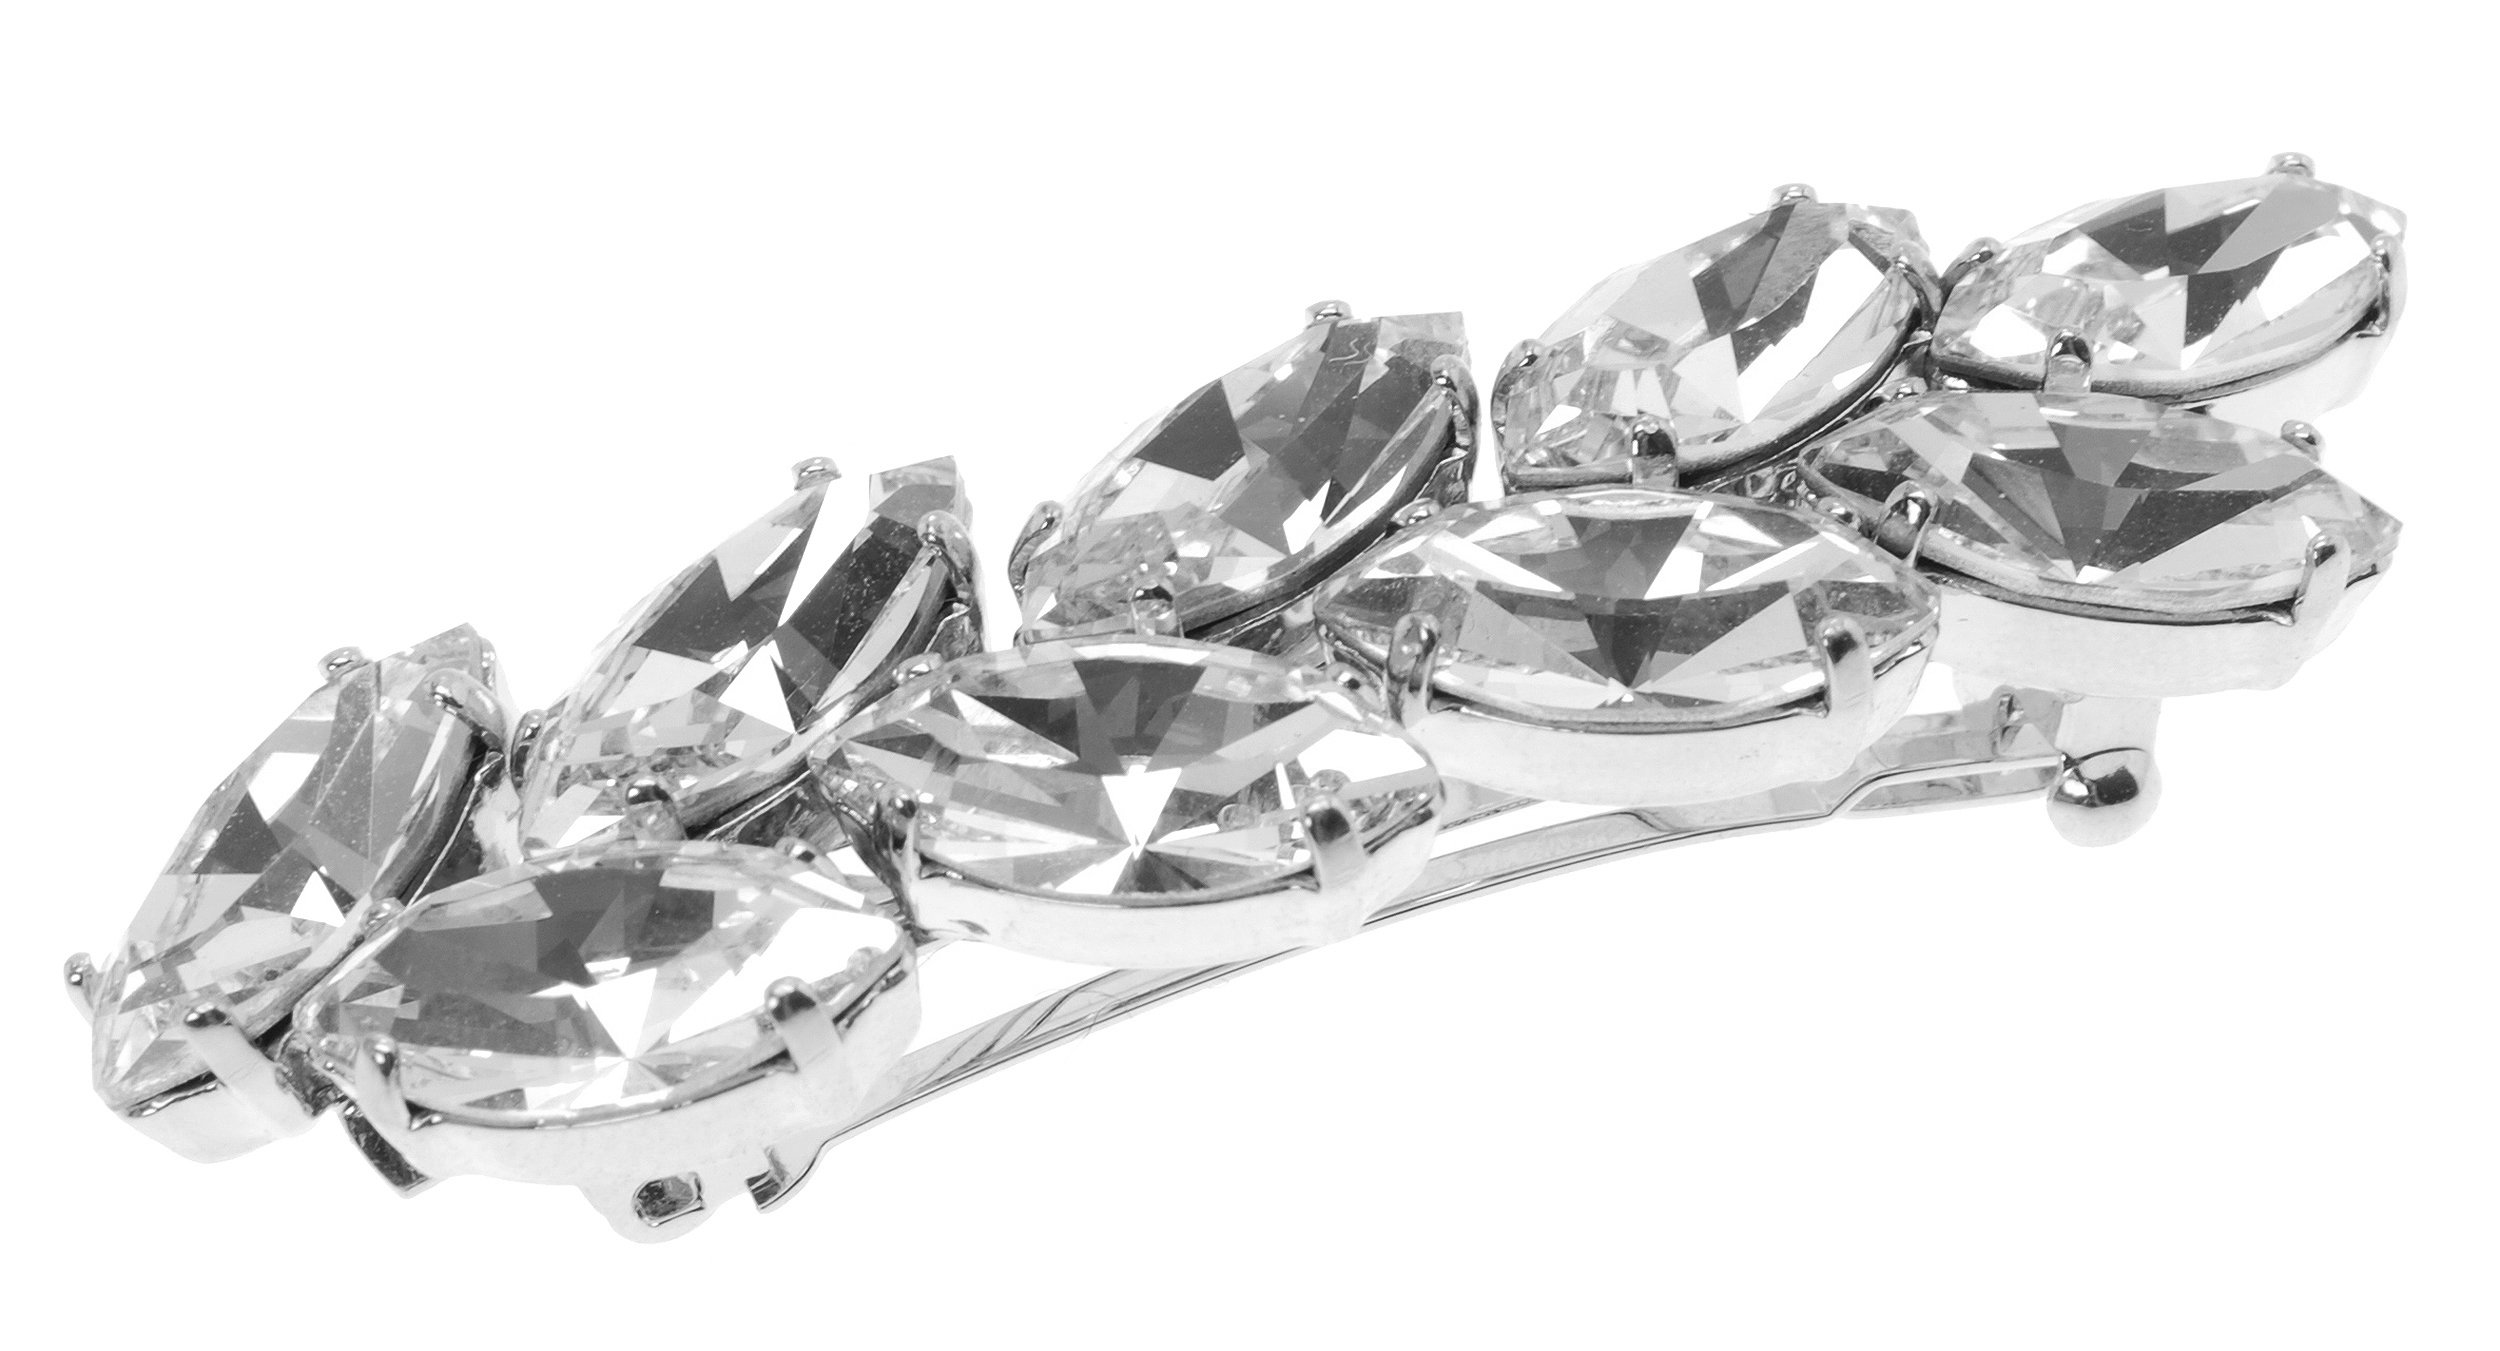 L. Erickson Small Ivy Crystal Barrette - Crystal/Silver